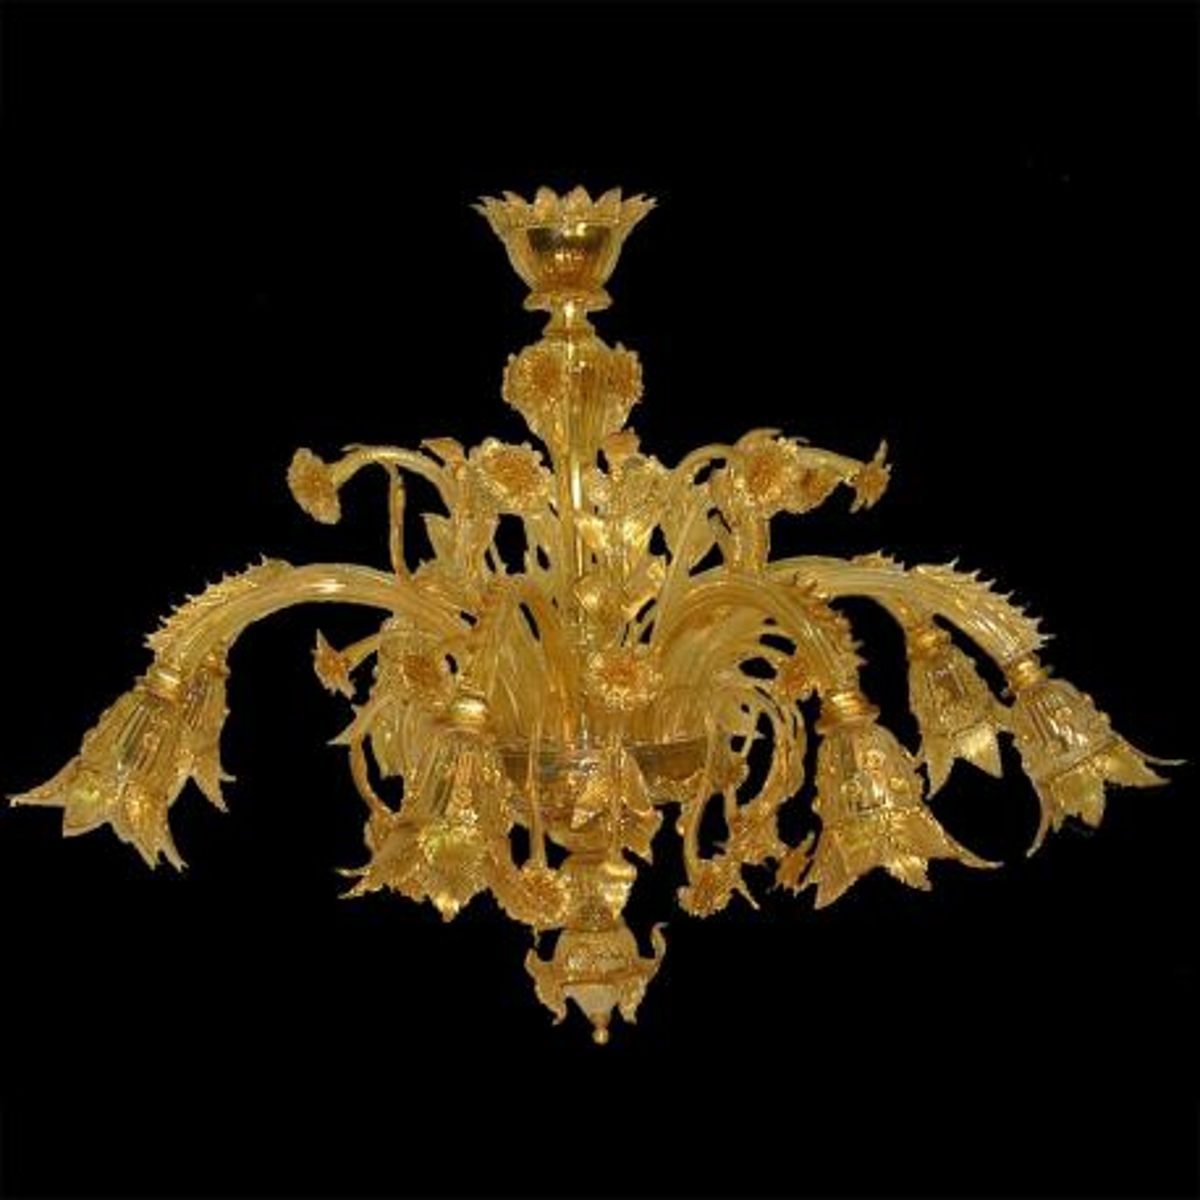 """Dorotea"" Murano glass chandelier - 8 lights - gold"